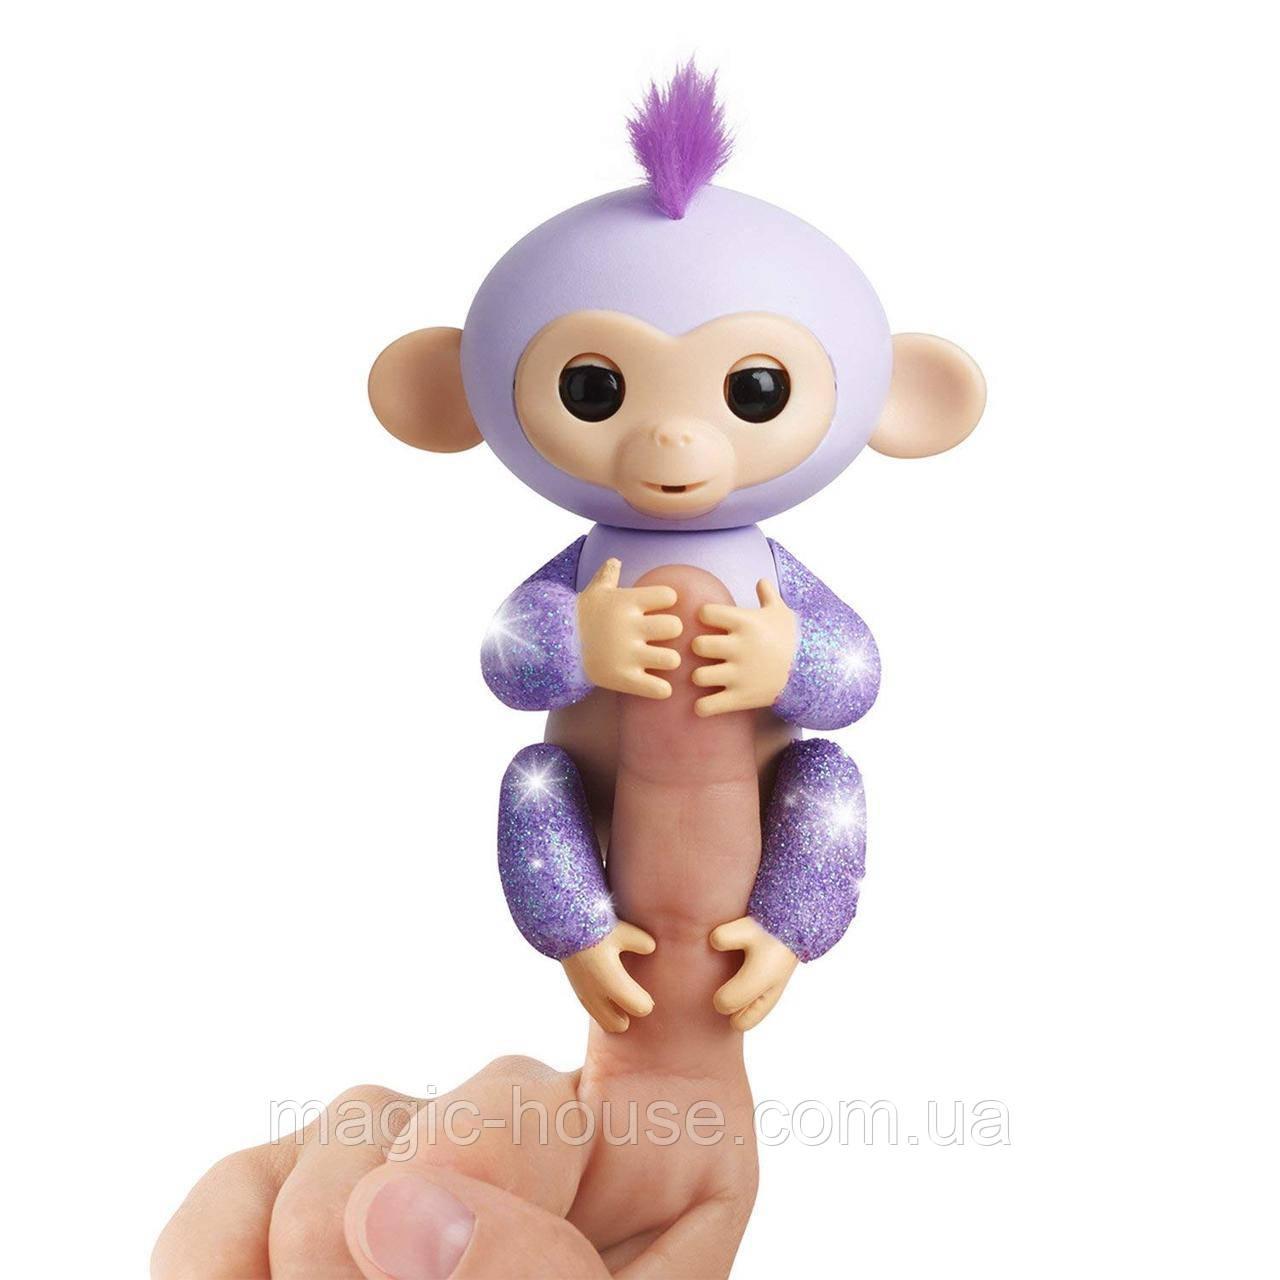 Оригинальная интерактивная ручная обезьянка Кики Блестящая Wow Wee Fingerlings Glitter Monkey Kiki (Purple Gli